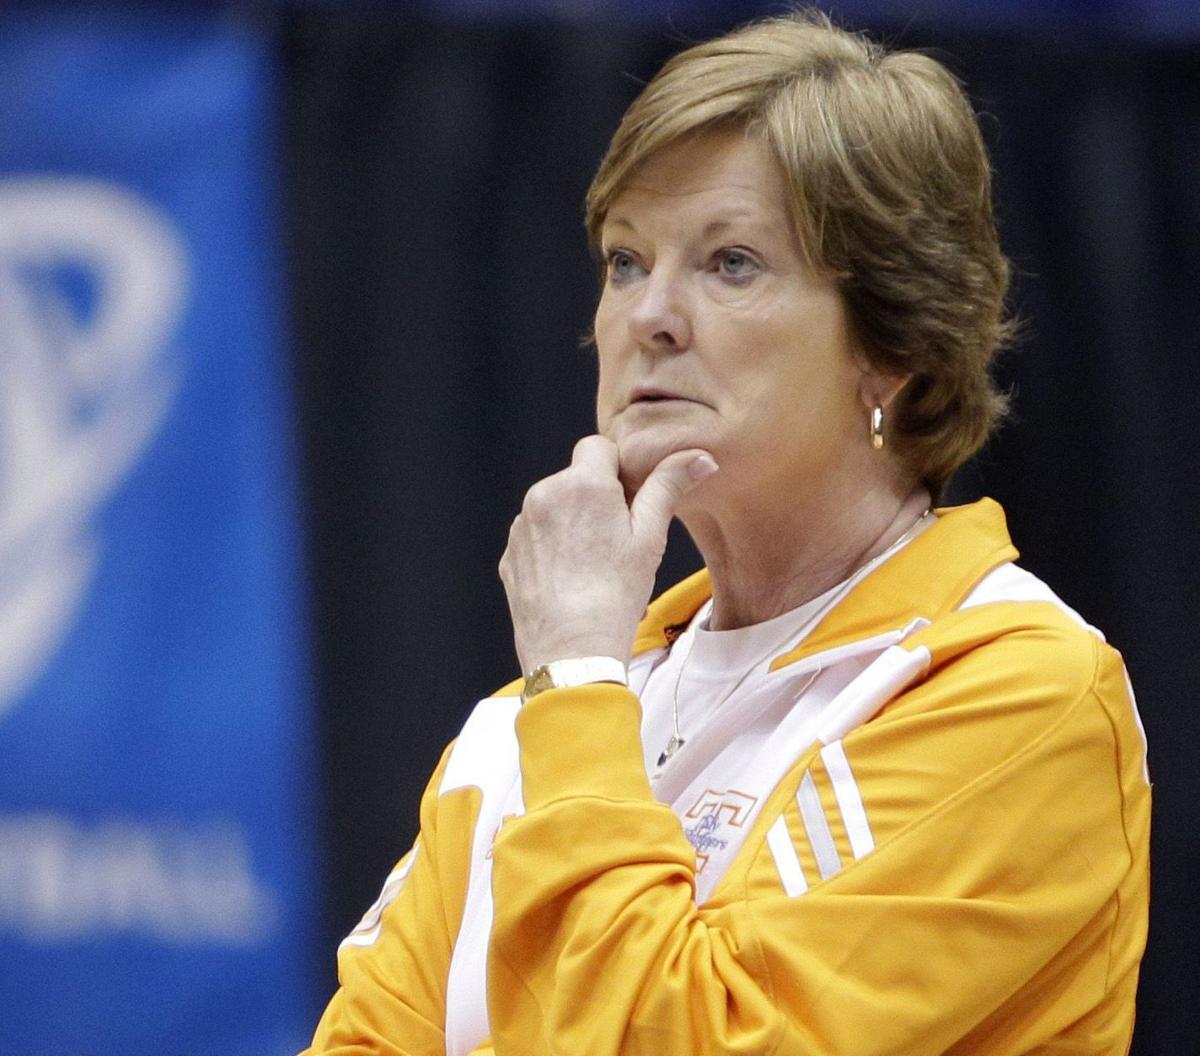 Tennessee's Summitt steps aside